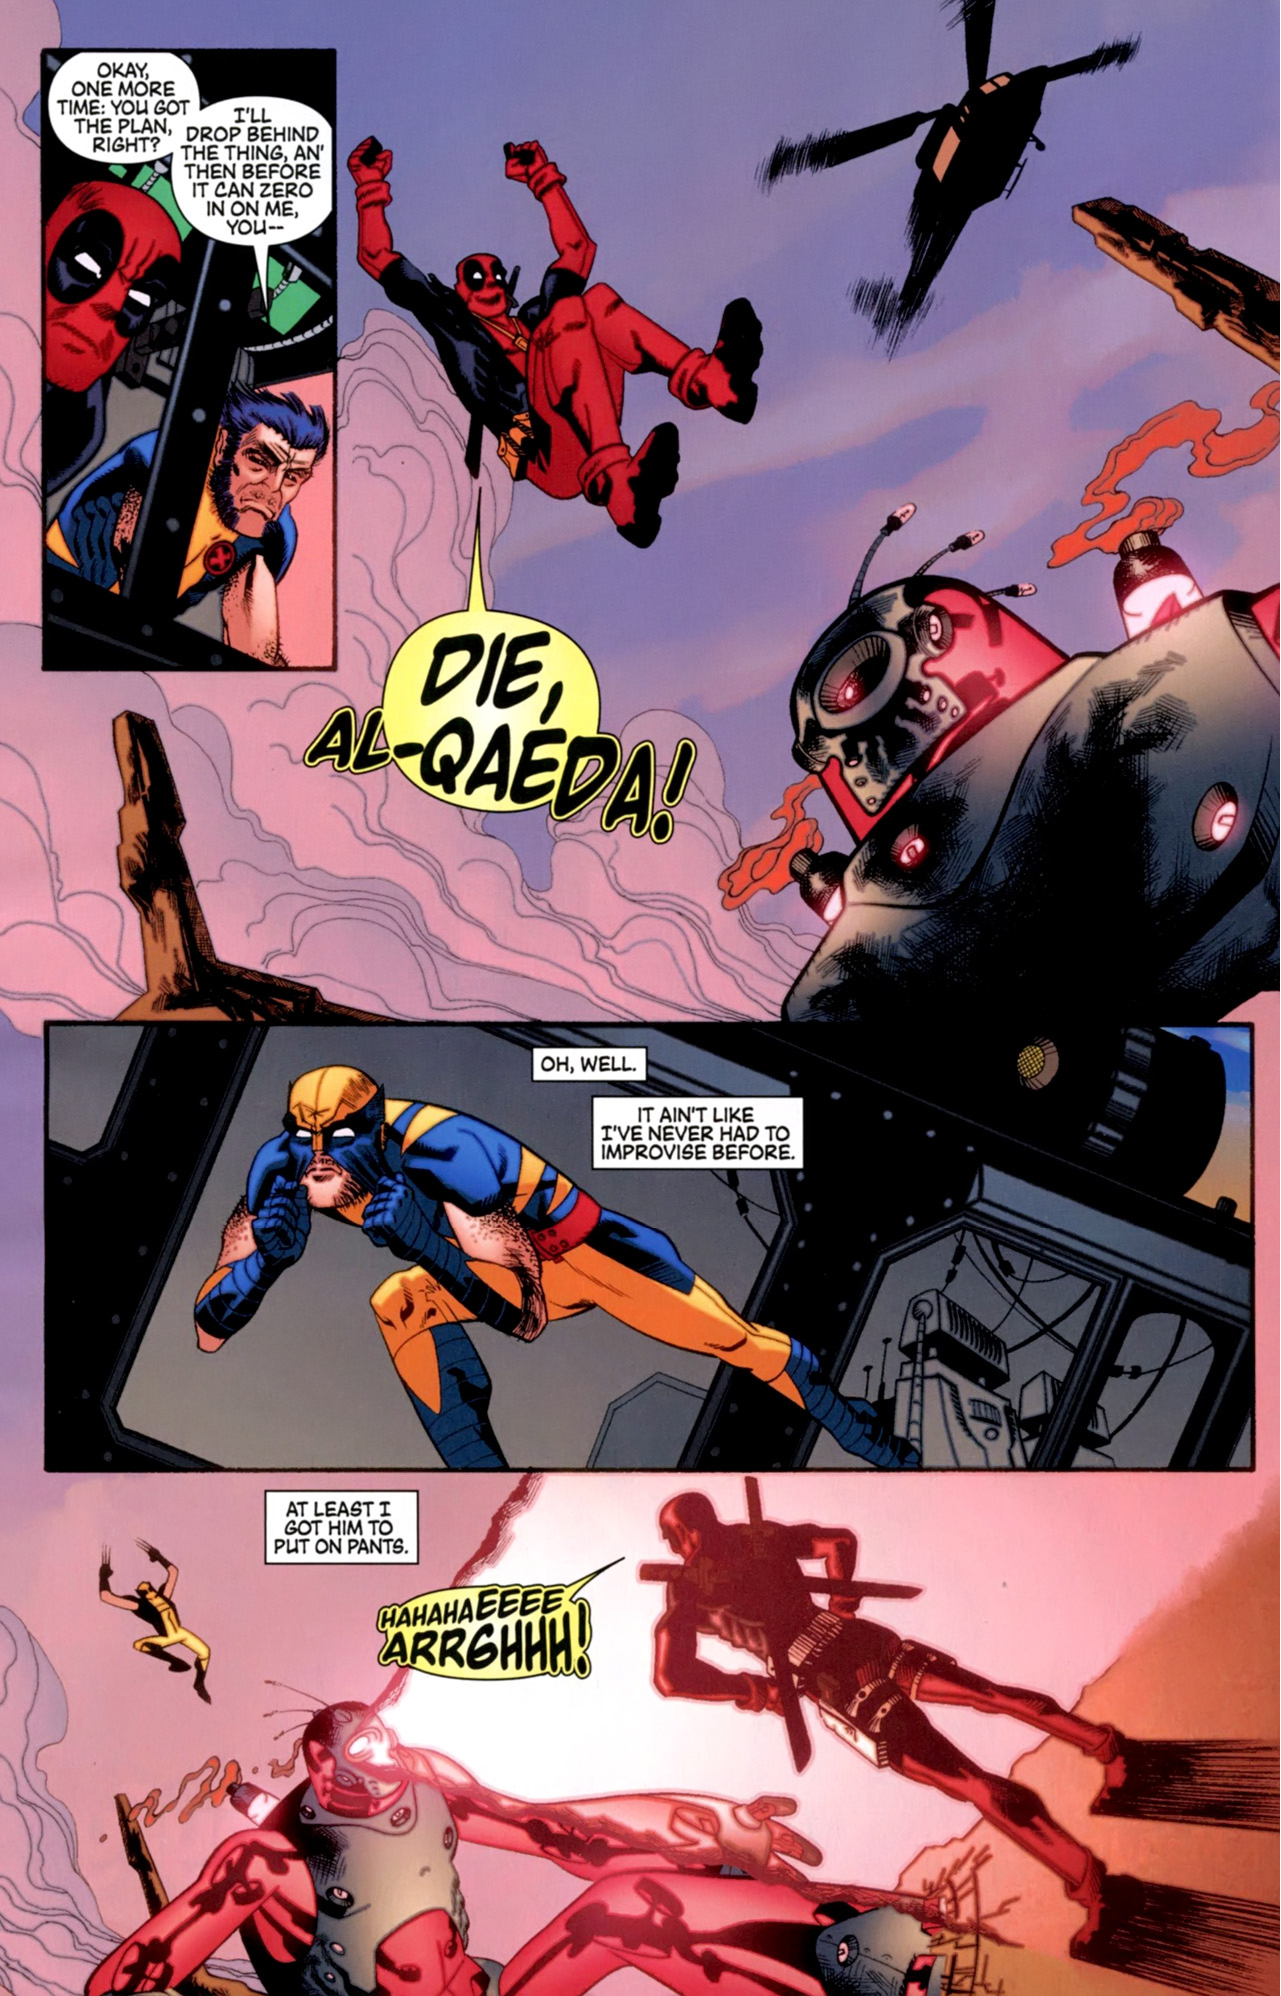 wolverine and deadpool vs shi'ar robot